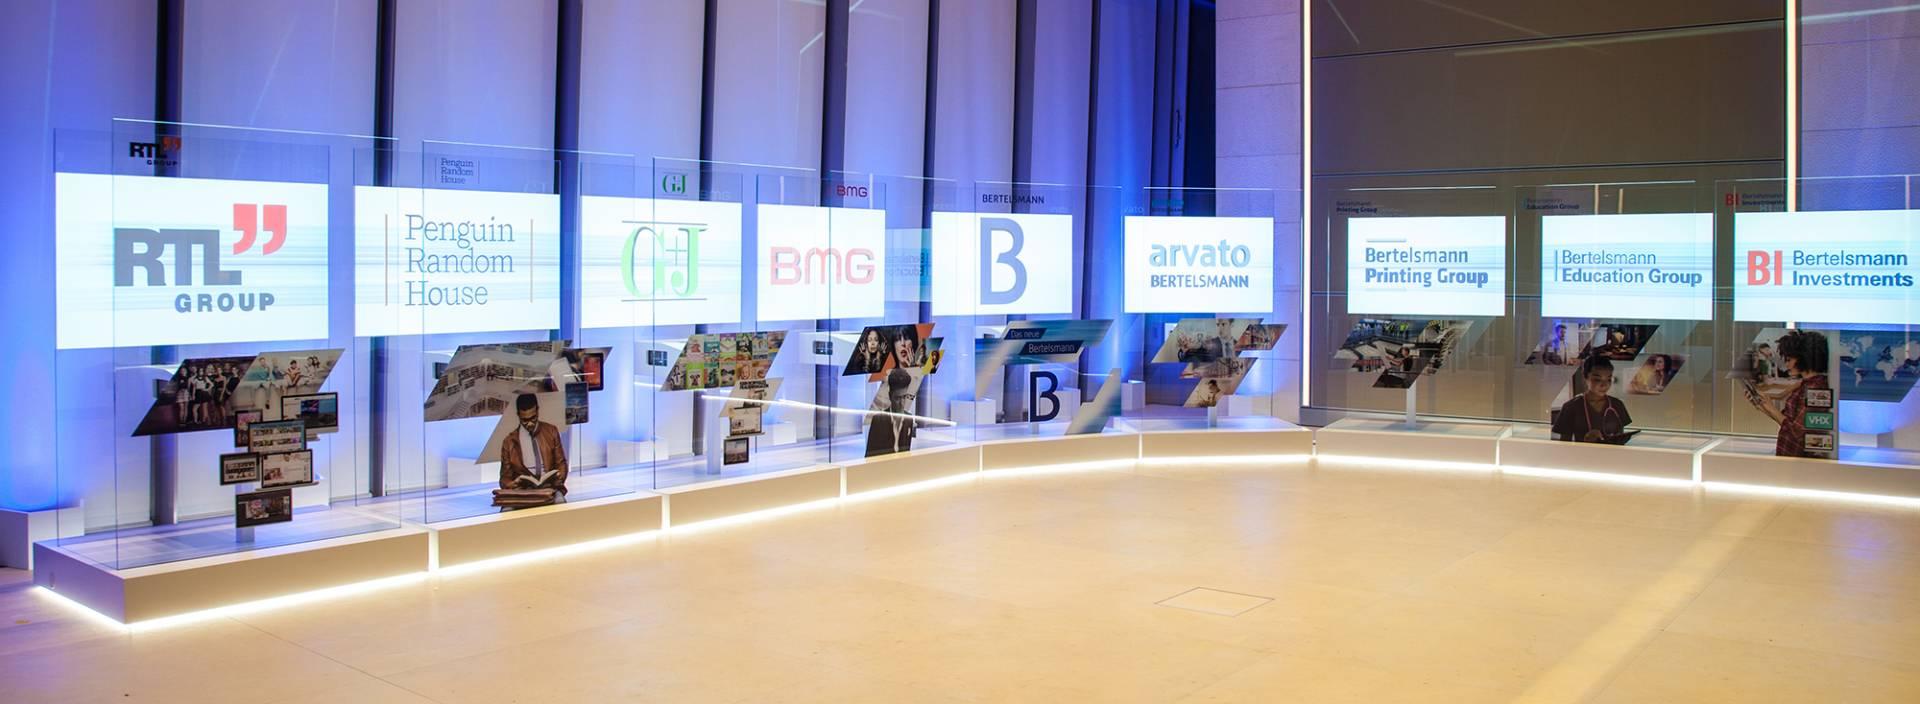 Bertelsmann - Projektion - Interactive Experiences - Creative Technology - Kurzdistanzprojektor - Synchronisierte Prajektionen - realtime visions